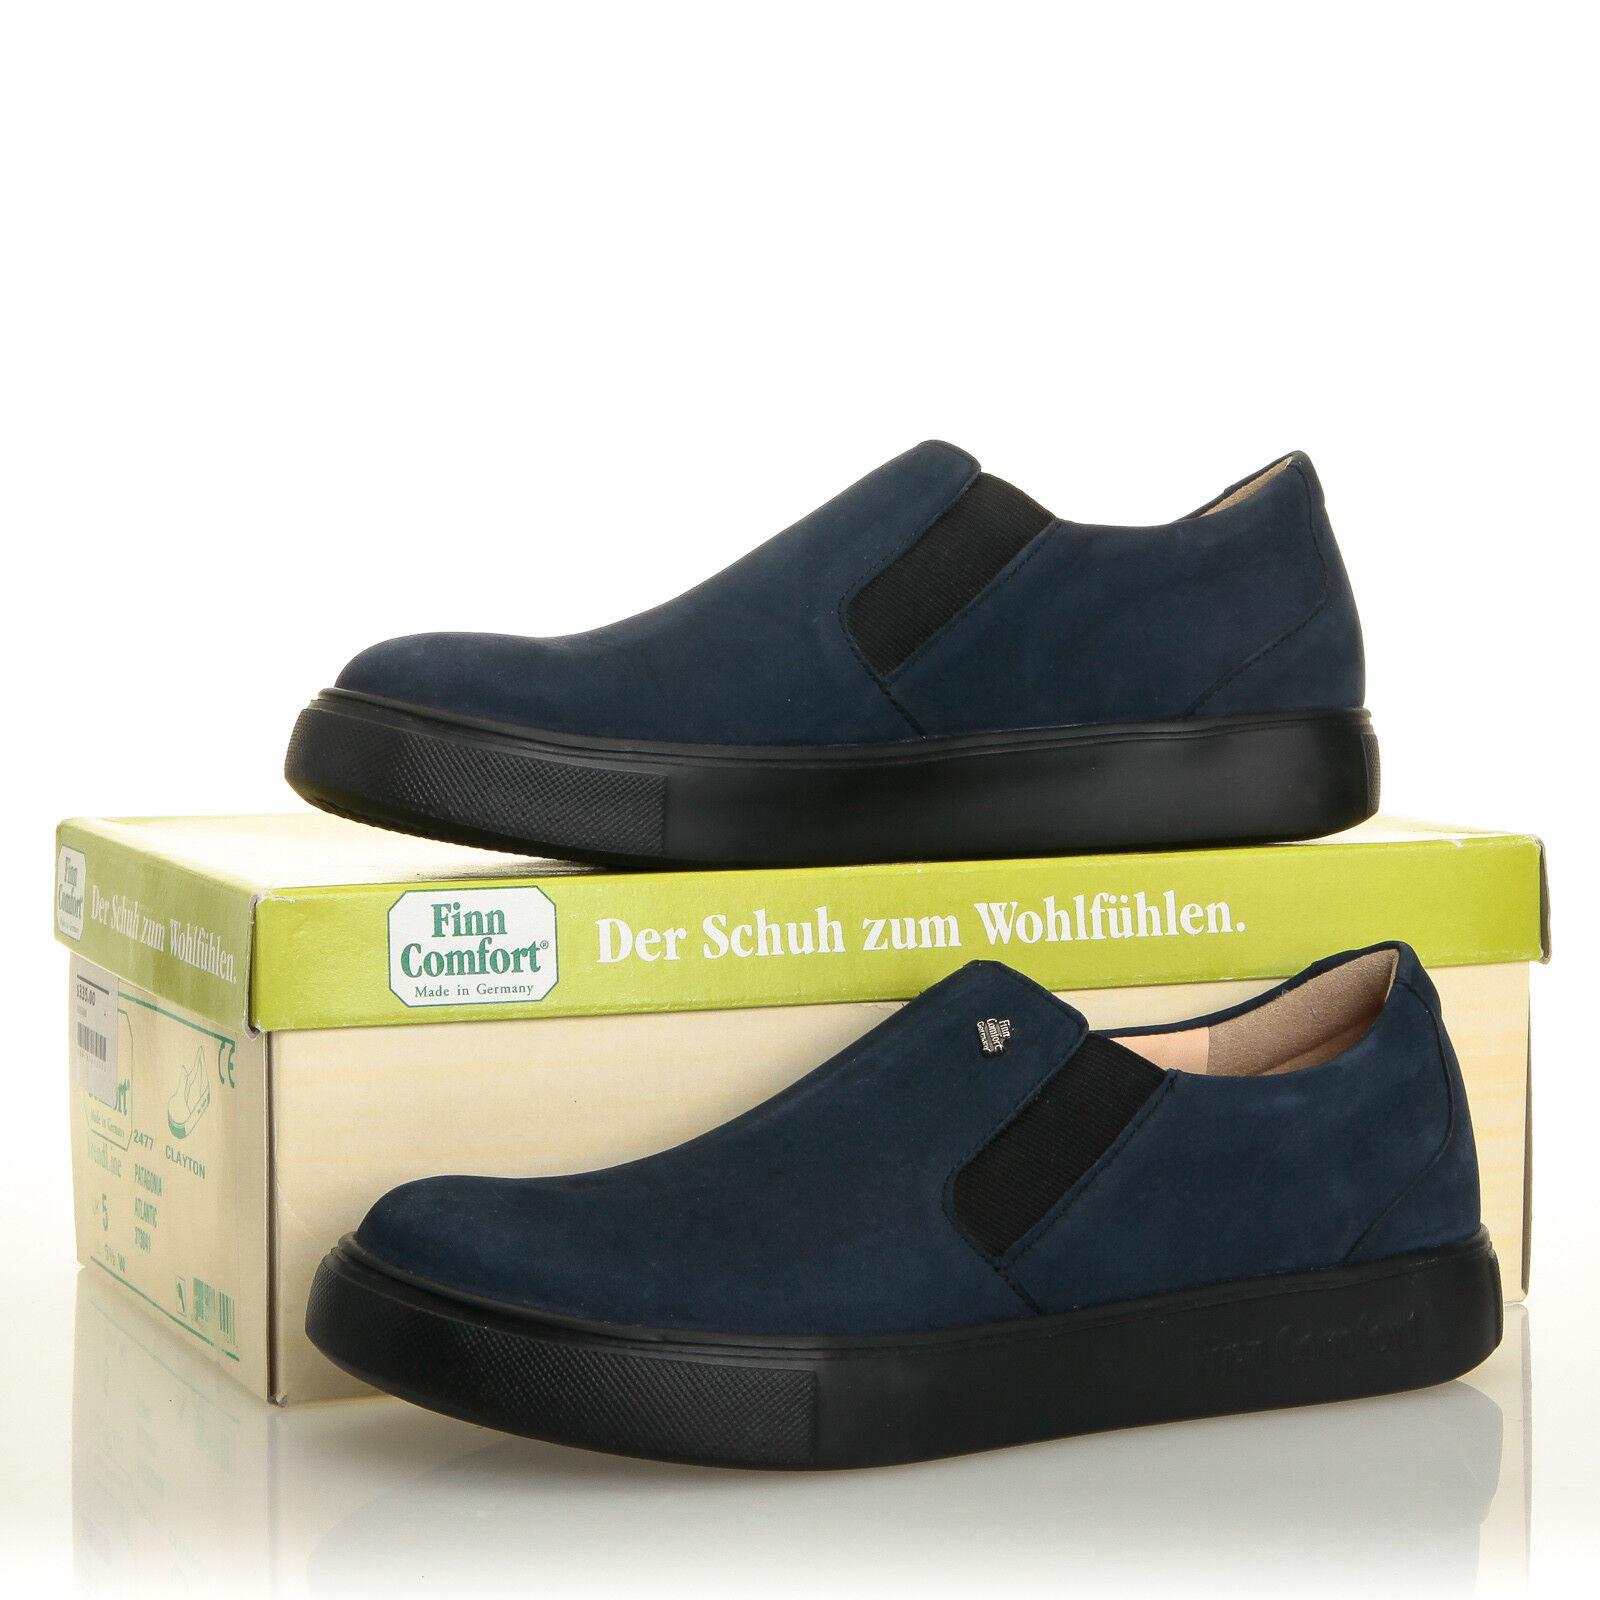 Finn Comfort Clayton Atlantic Blue Nubuck Leather Slip-On Scarpe da Ginnastica - Size 5.5 US